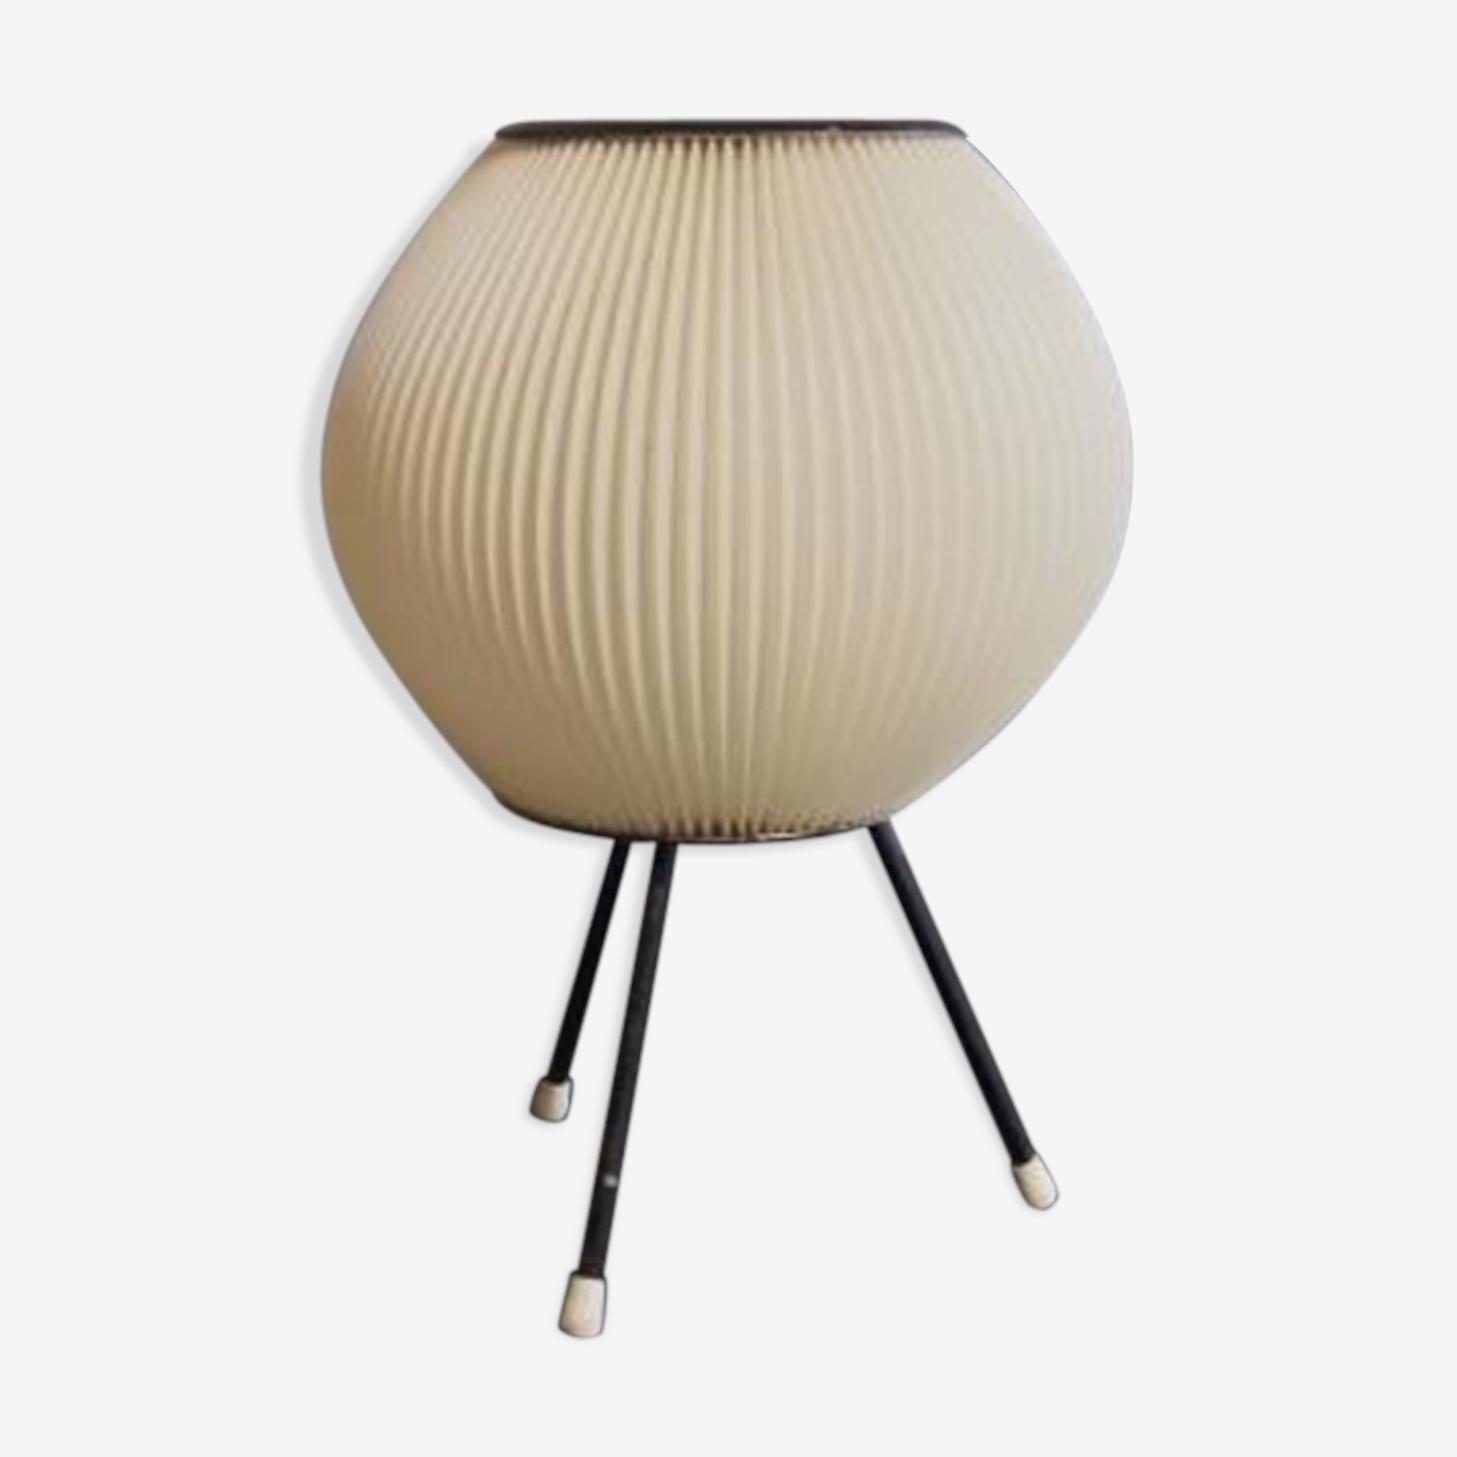 Lampe vintage black-laquered